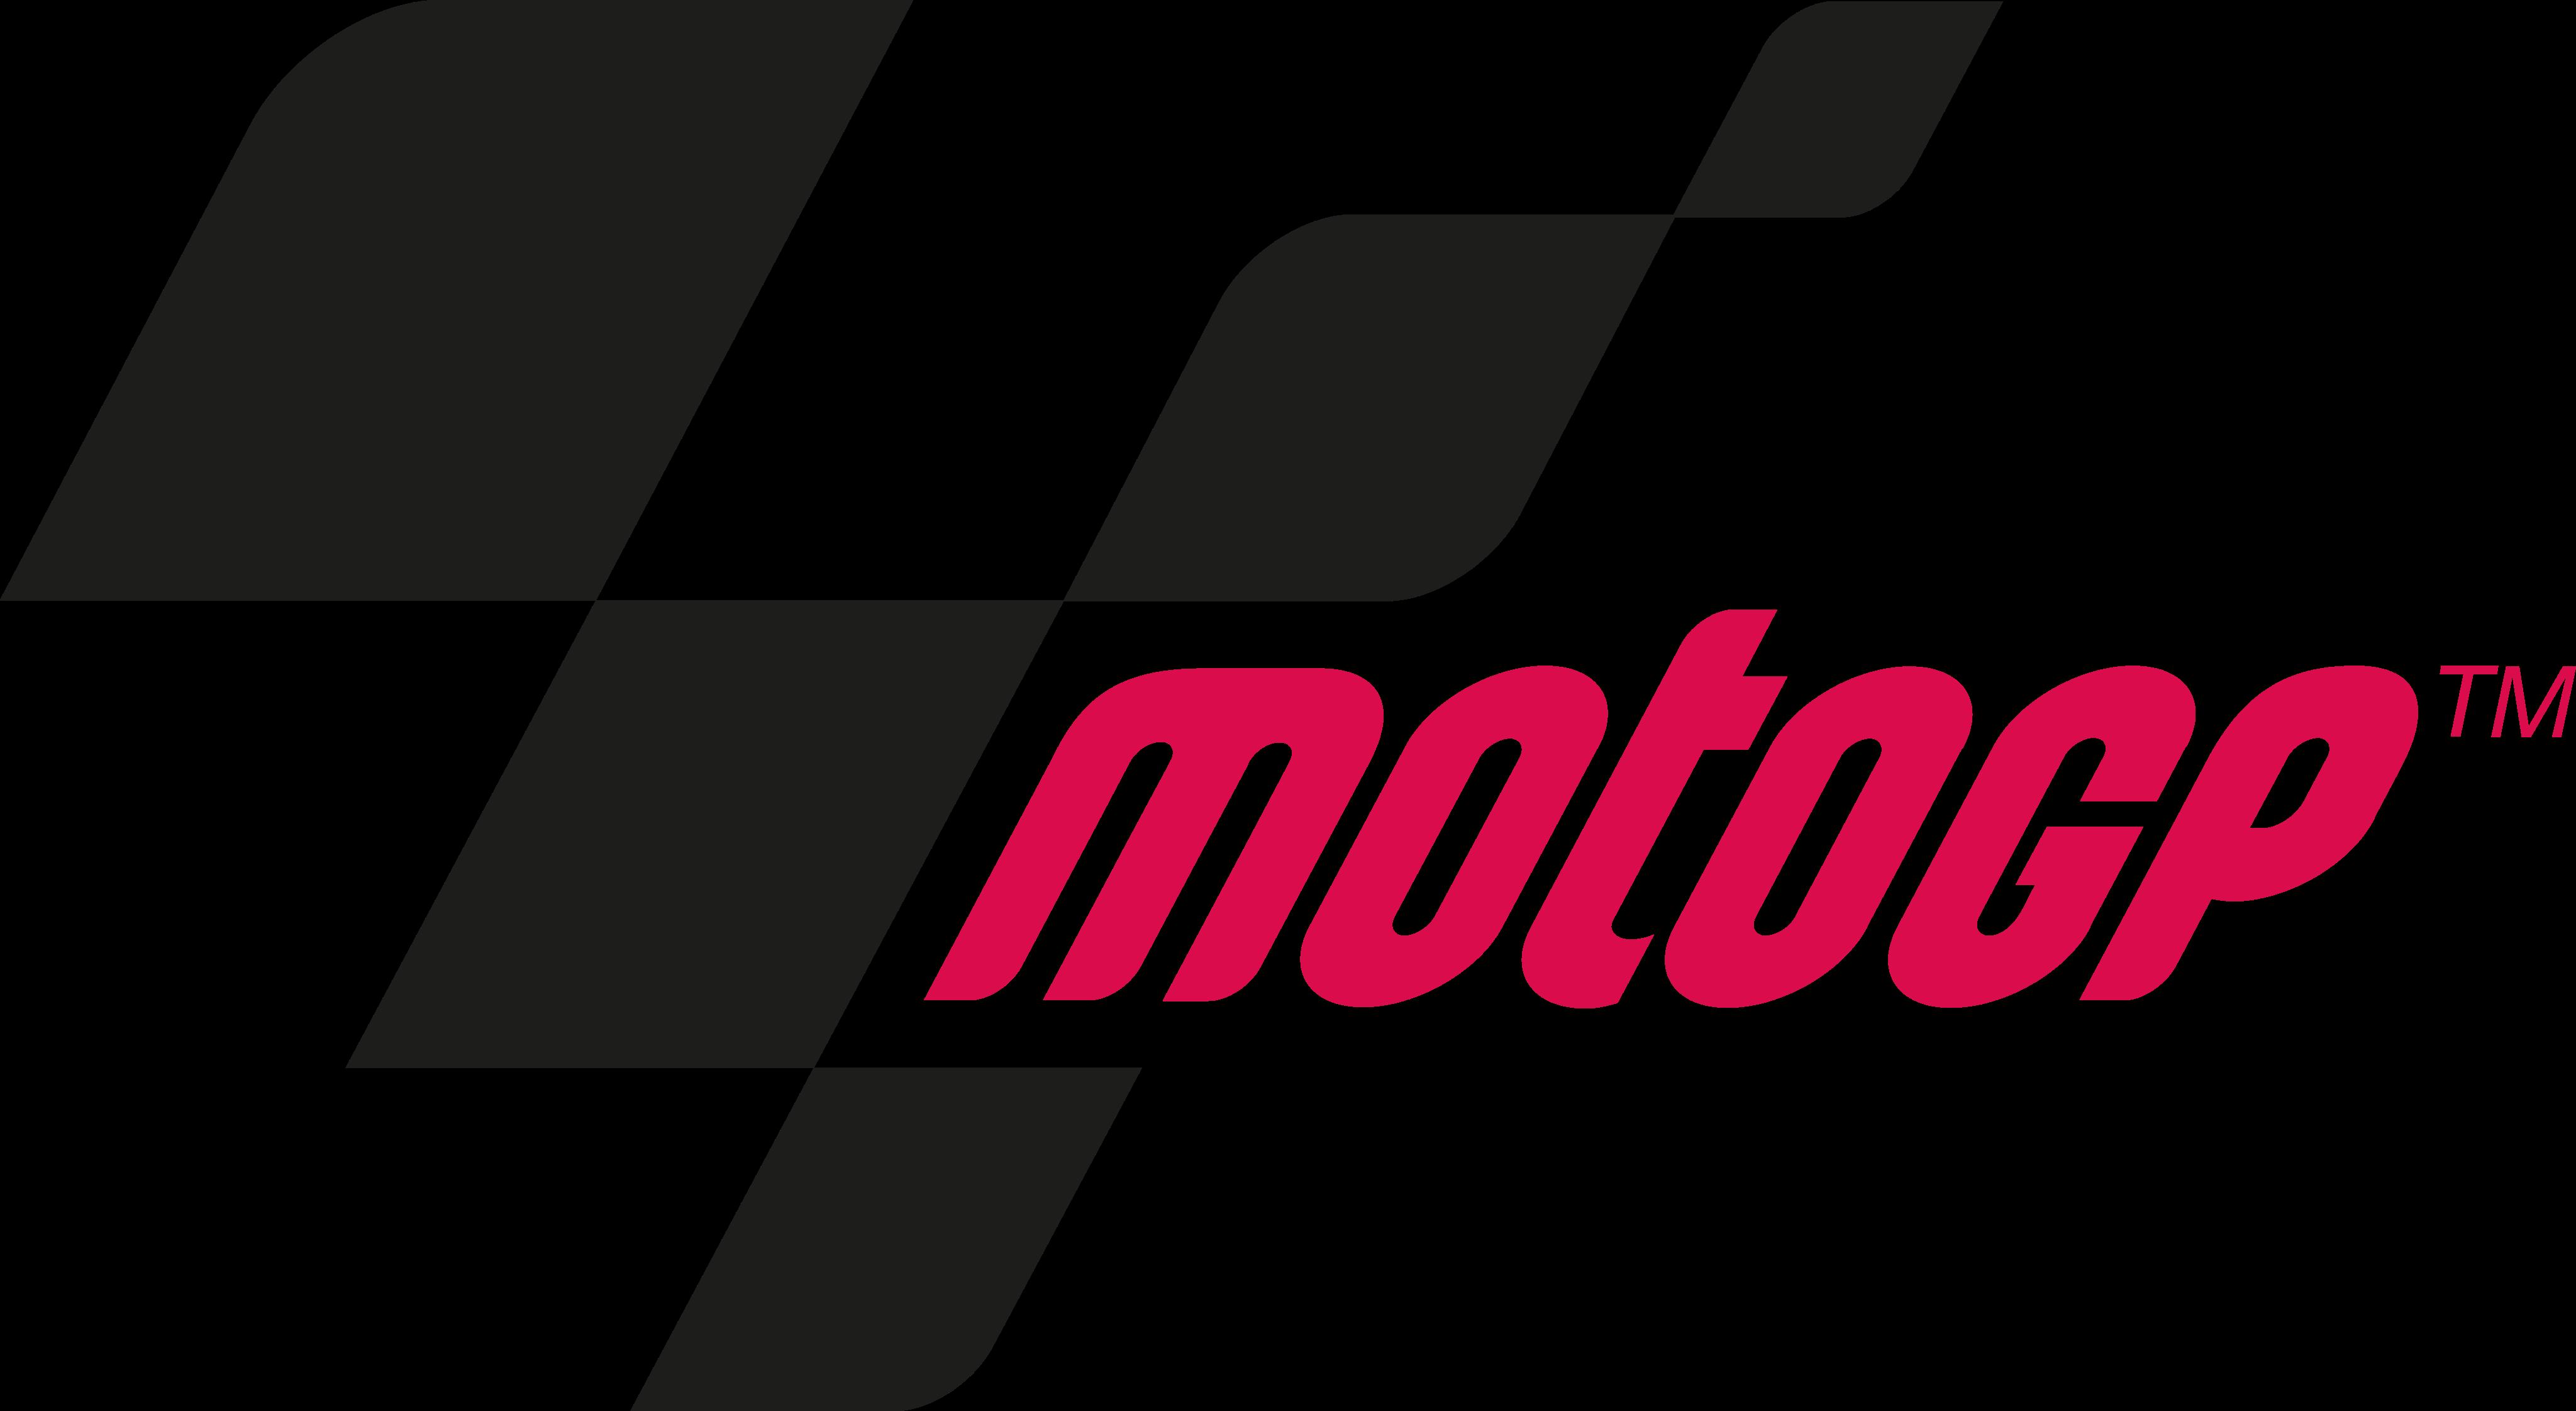 moto gp logo - Moto GP Logo